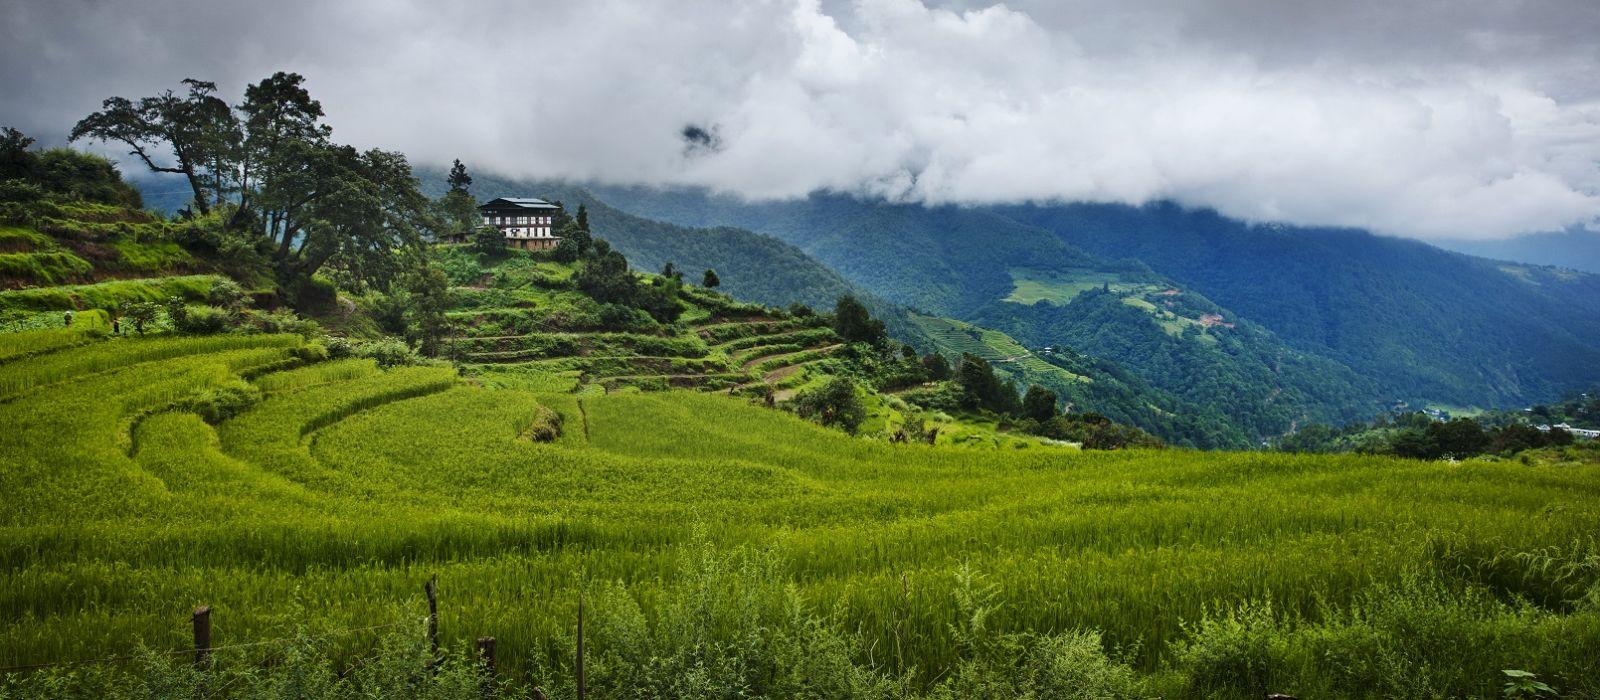 Luxury Bhutan & Thailand Paradise Islands Tour Trip 2